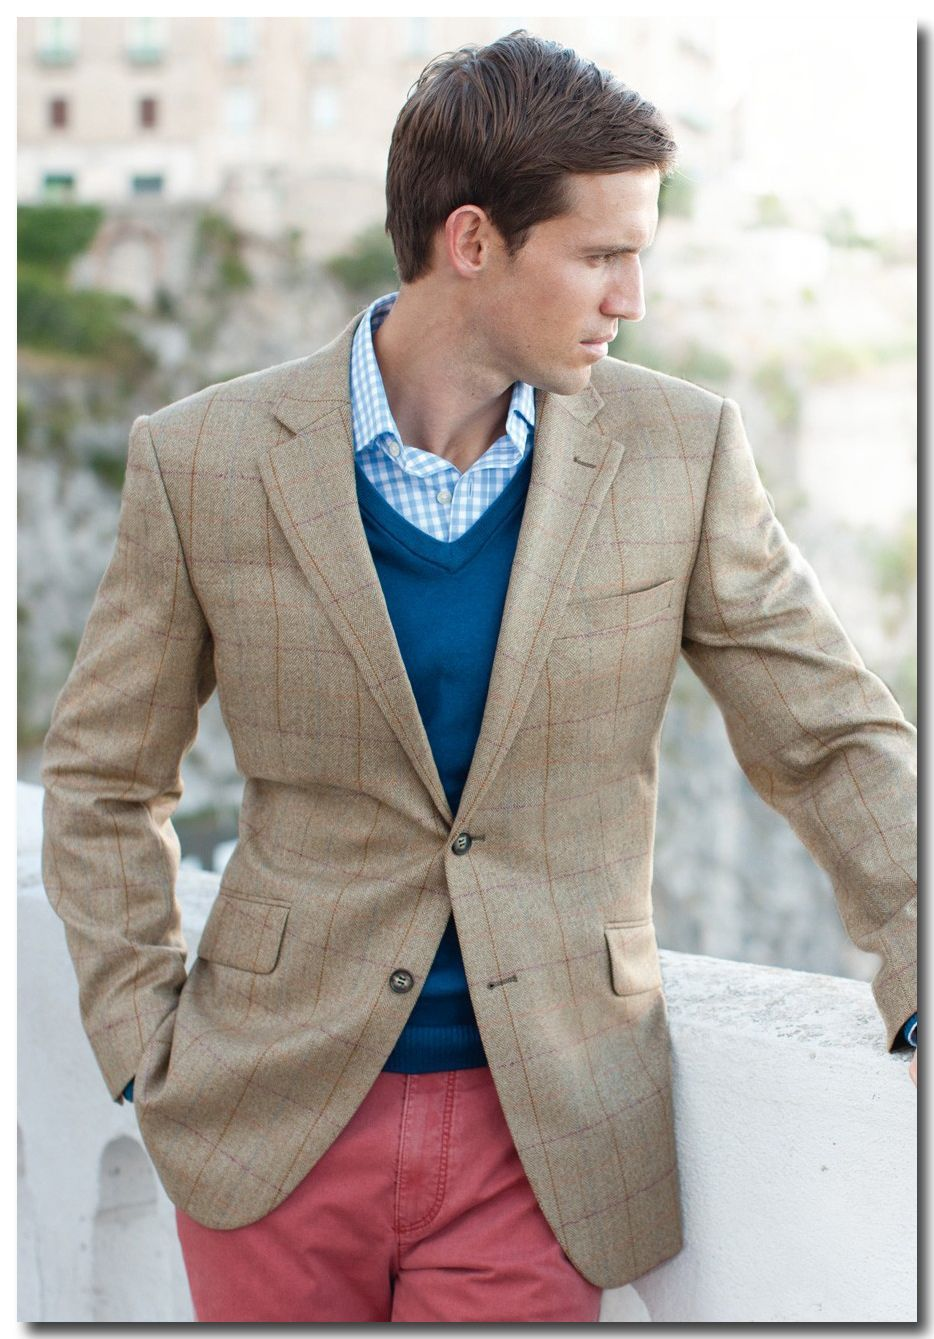 Osprey Jacket 100 Wool Summer Tweed Jacket | Gentleman's stuff ...